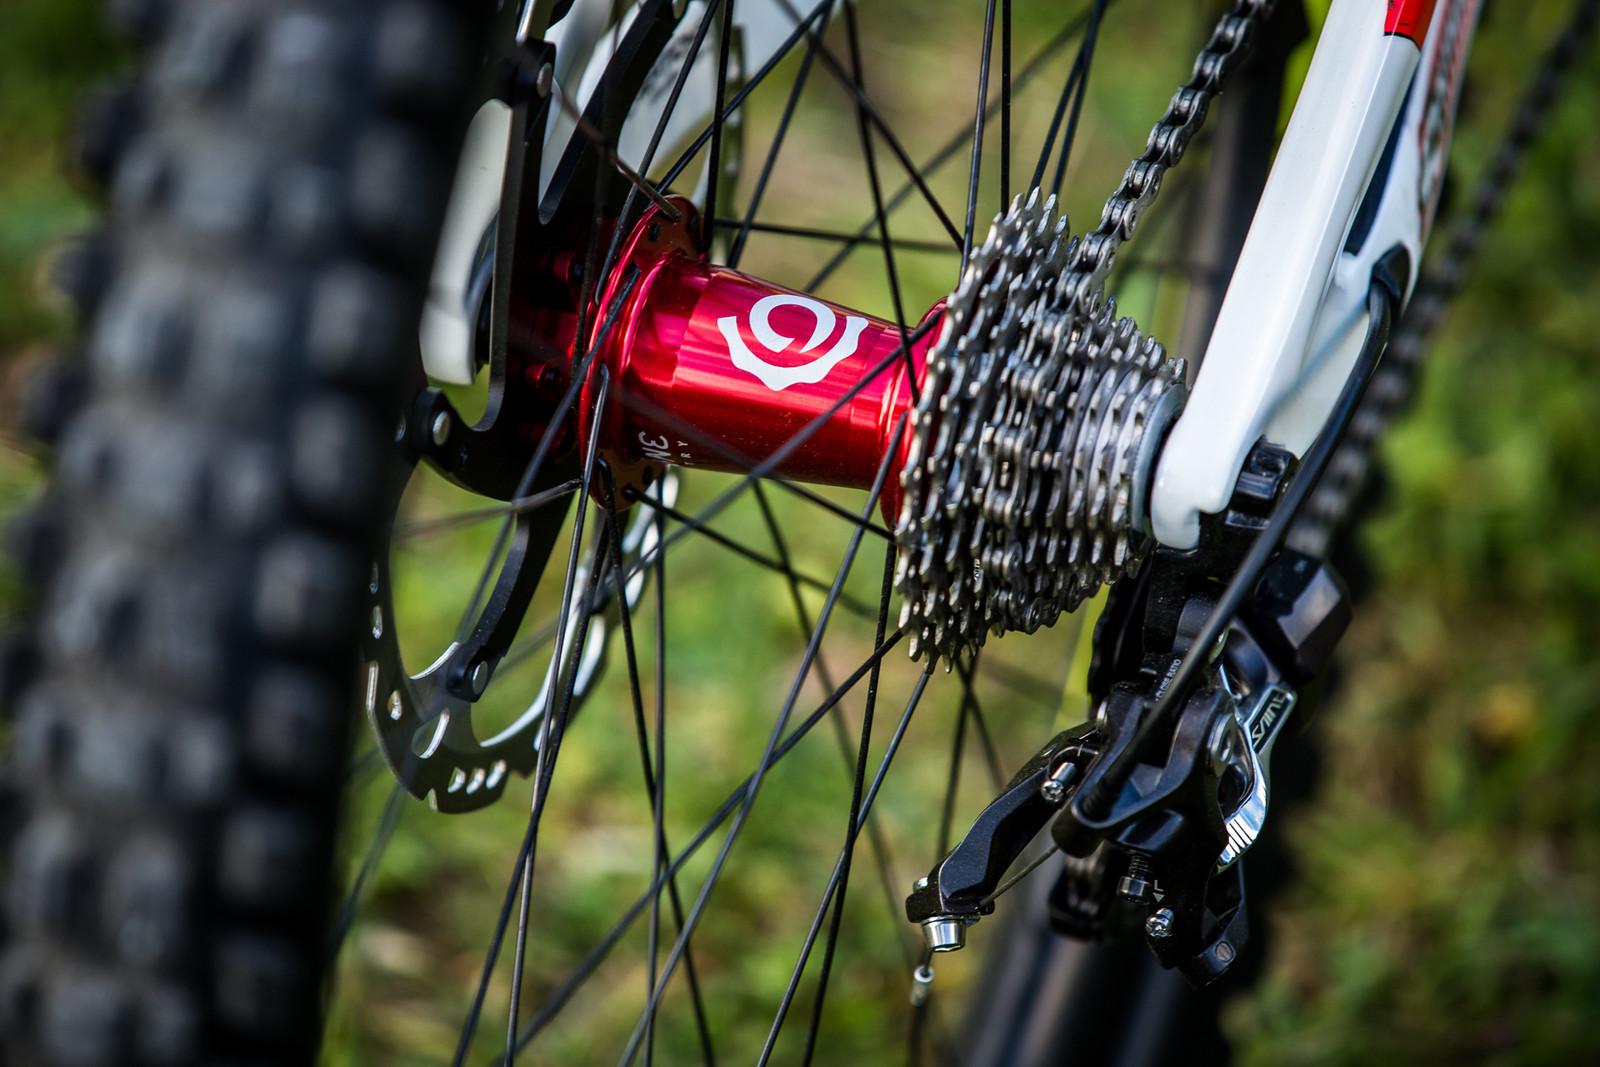 Industry Nine Bling - WORLD CHAMPS BIKE - Emilie Siegenthaler's Pivot Phoenix - Mountain Biking Pictures - Vital MTB